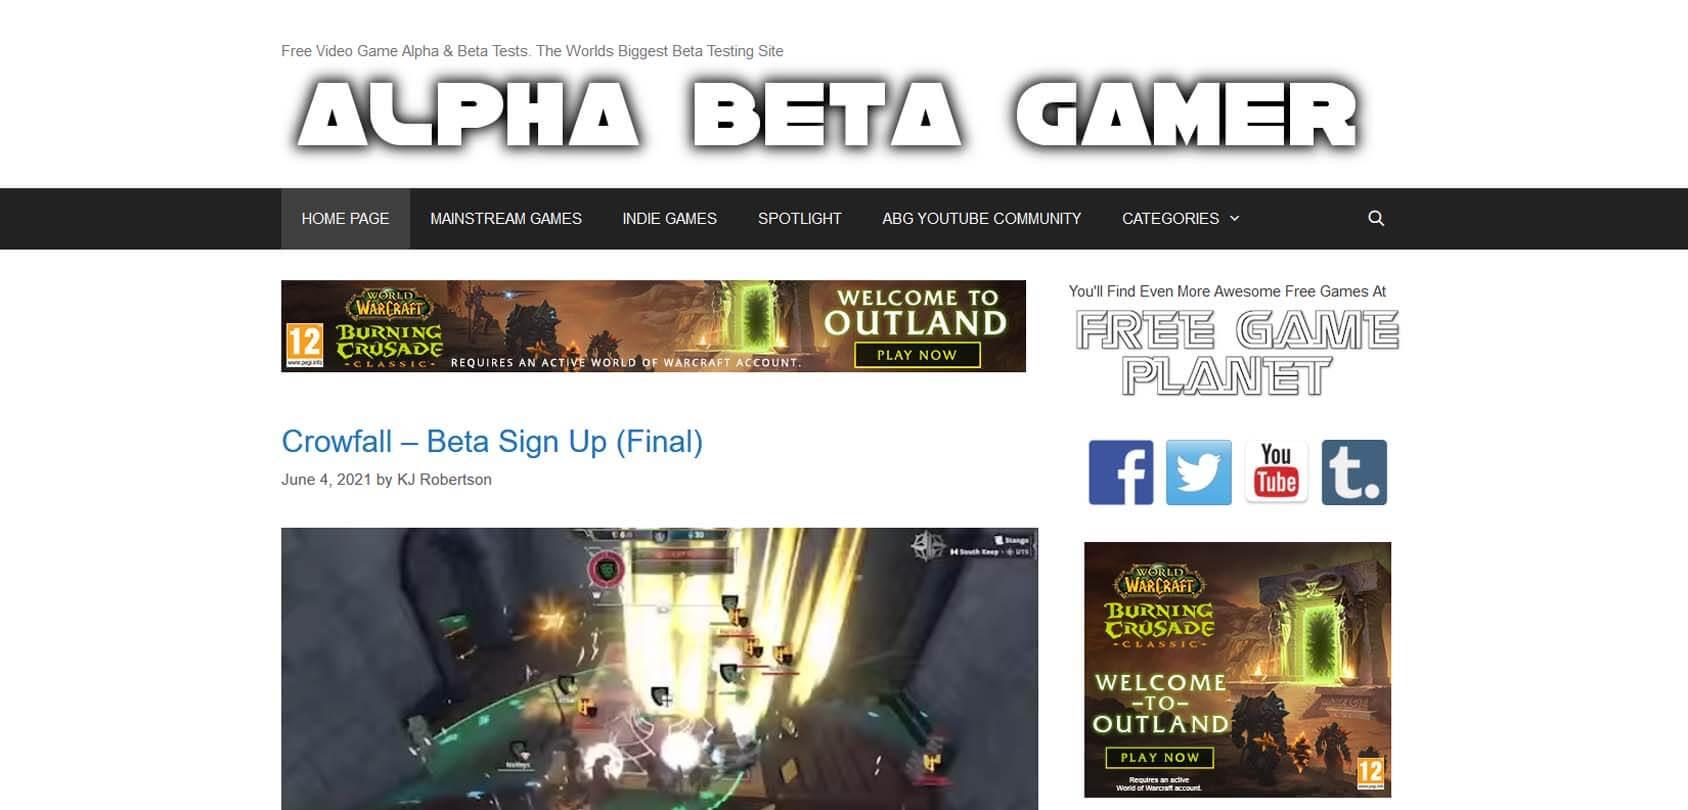 Alpha Beta Gamer Homepage